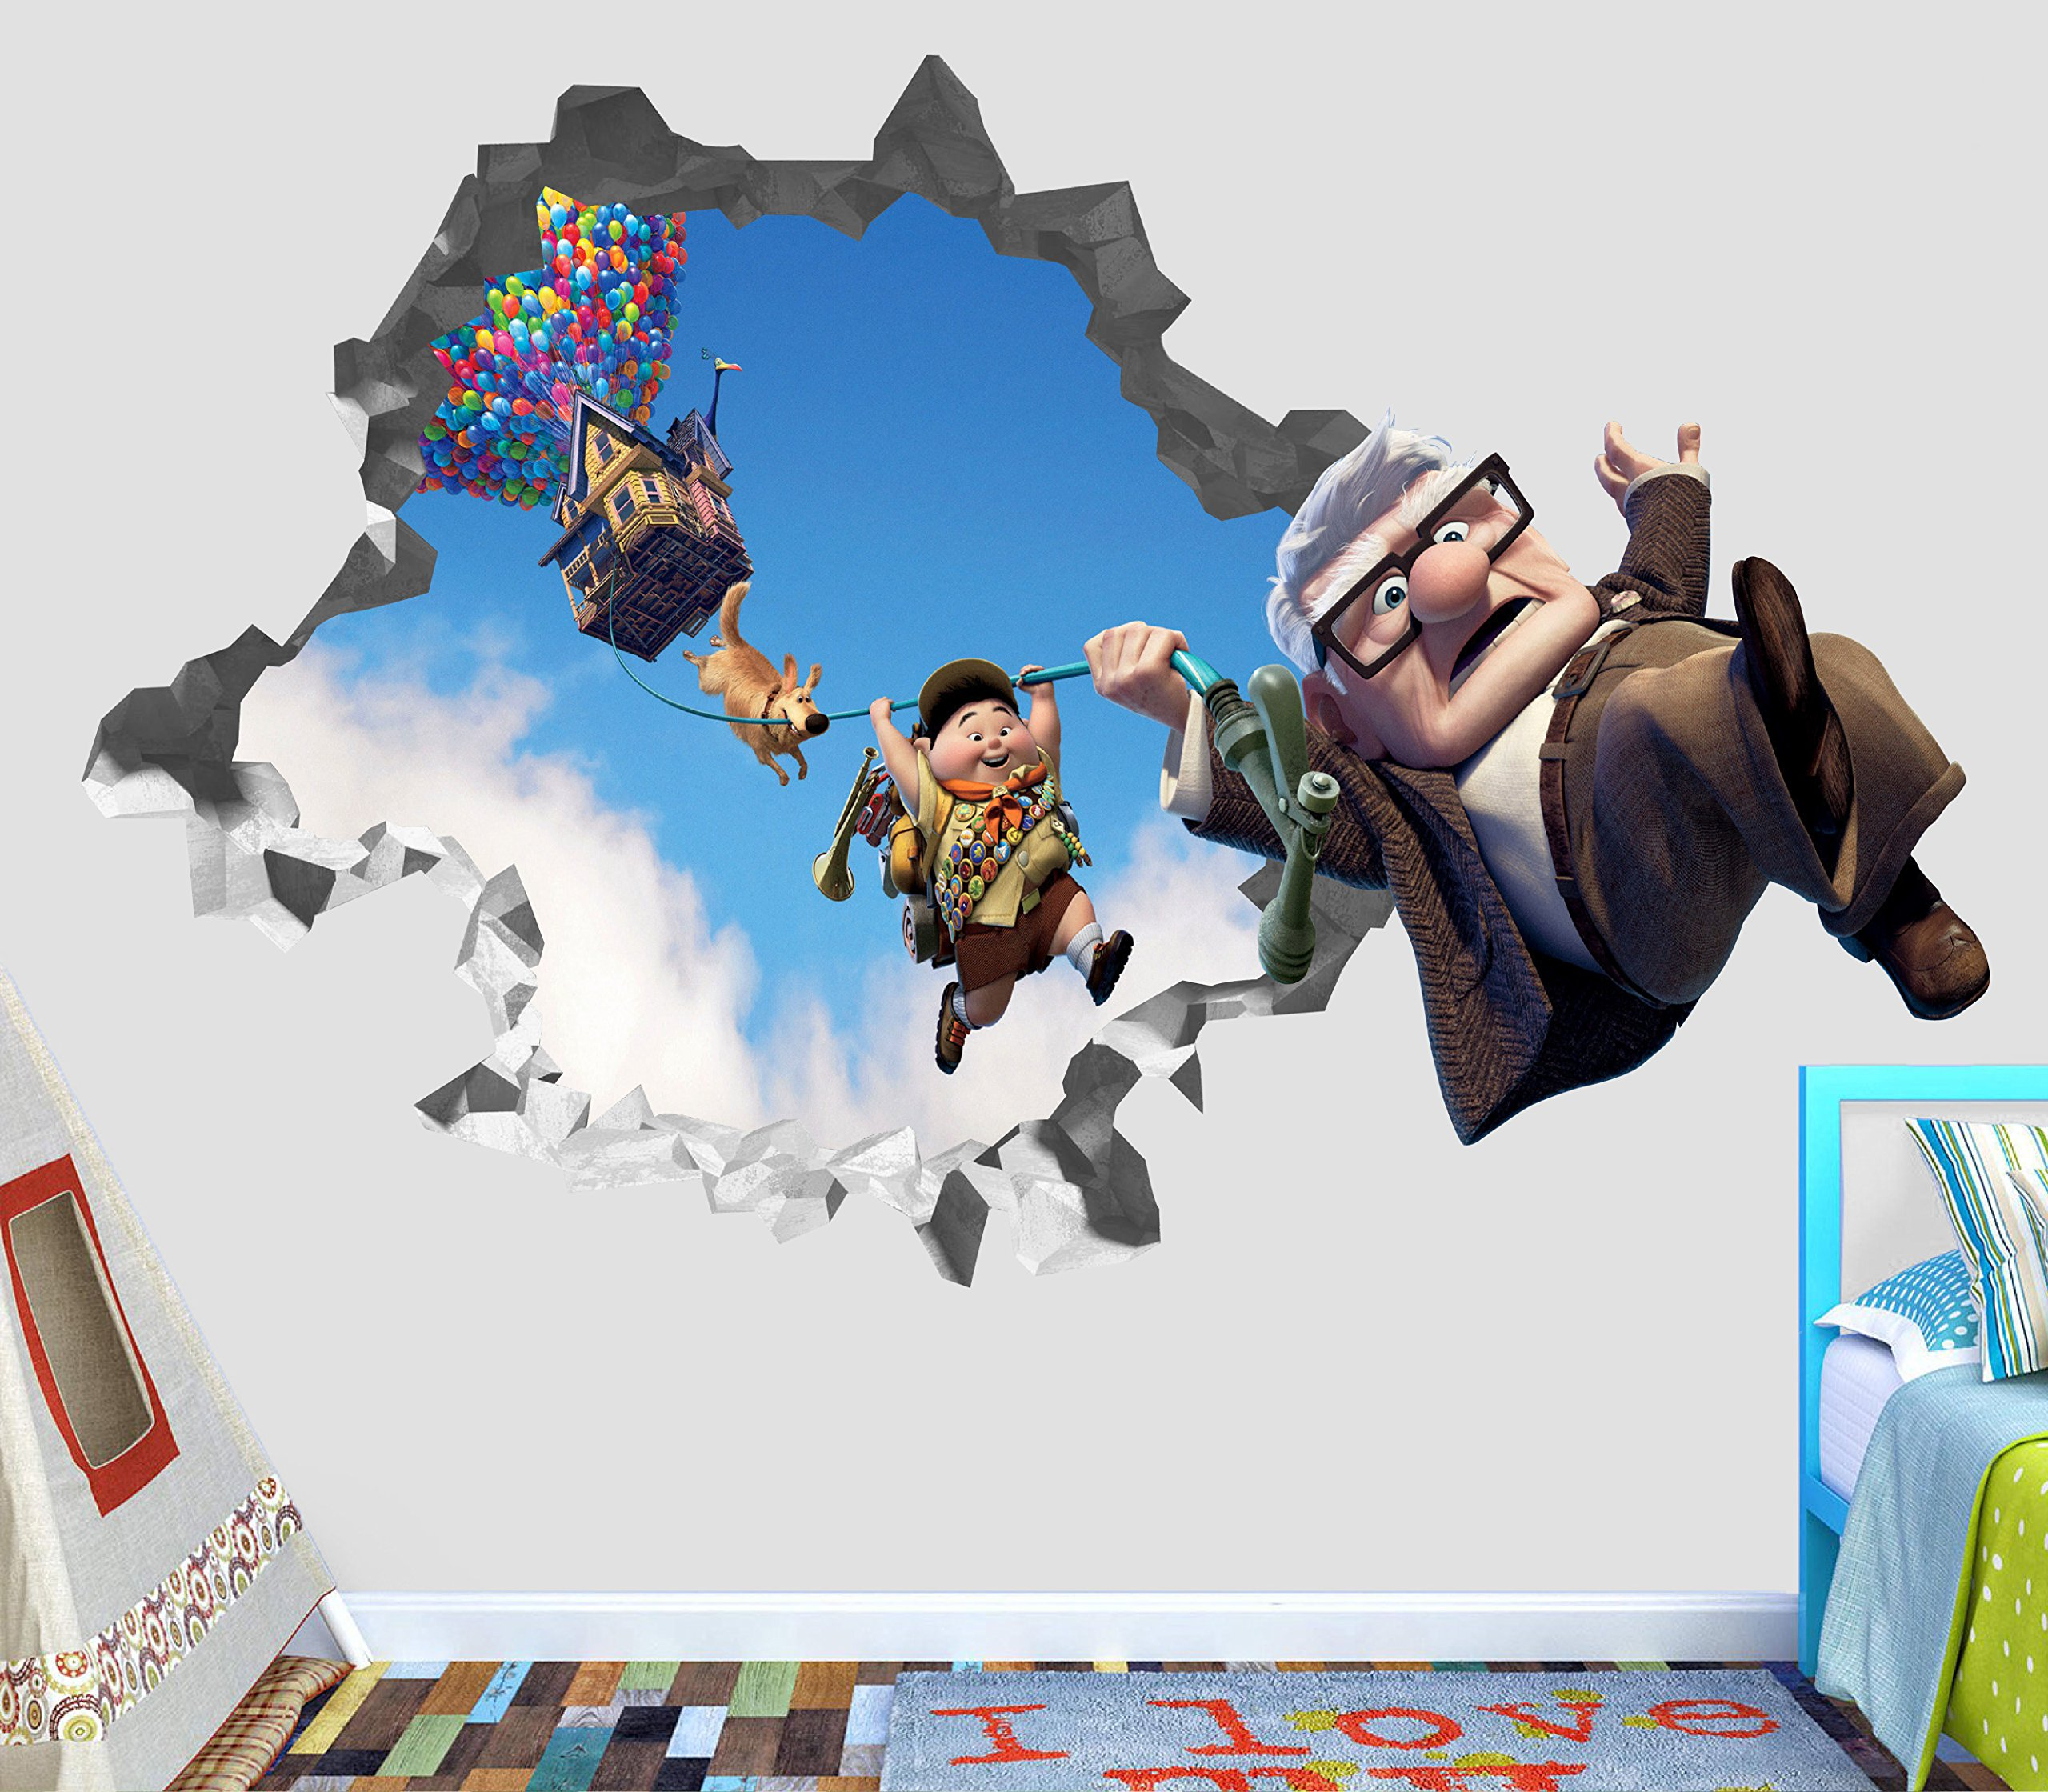 Up Movie Disney Pixar Carl Russel Paradise Falls Balloons Wall Decal Sticker Vinyl Decor Door Window Poster Mural - Broken Wall - 3D Designs - OP36 (Small (Wide 22'' x 12'' Height))